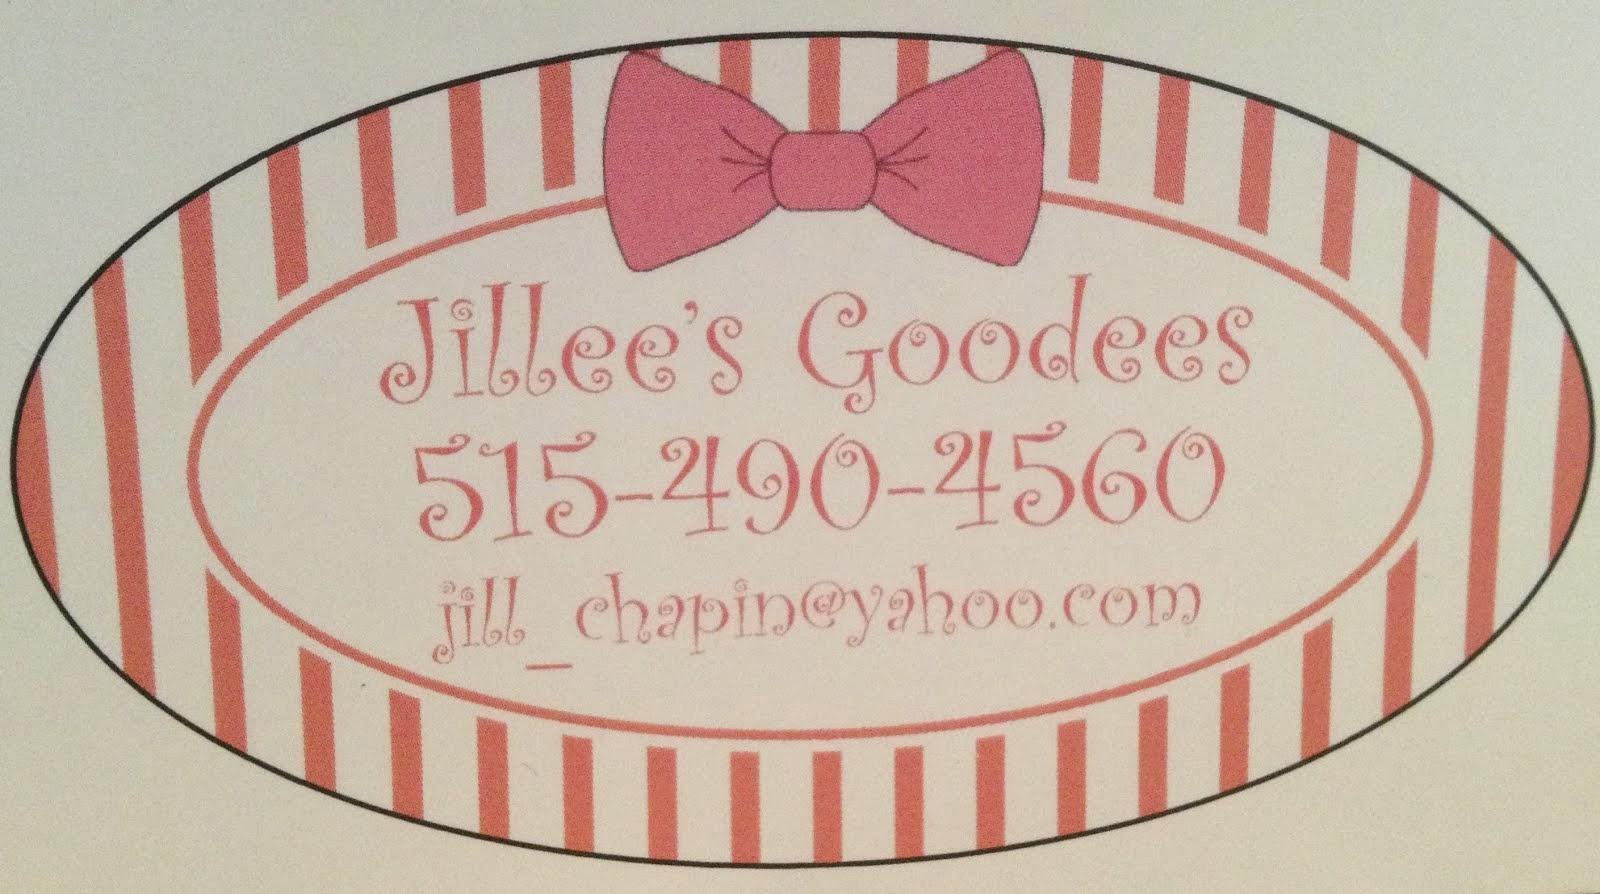 Jillee's Goodees